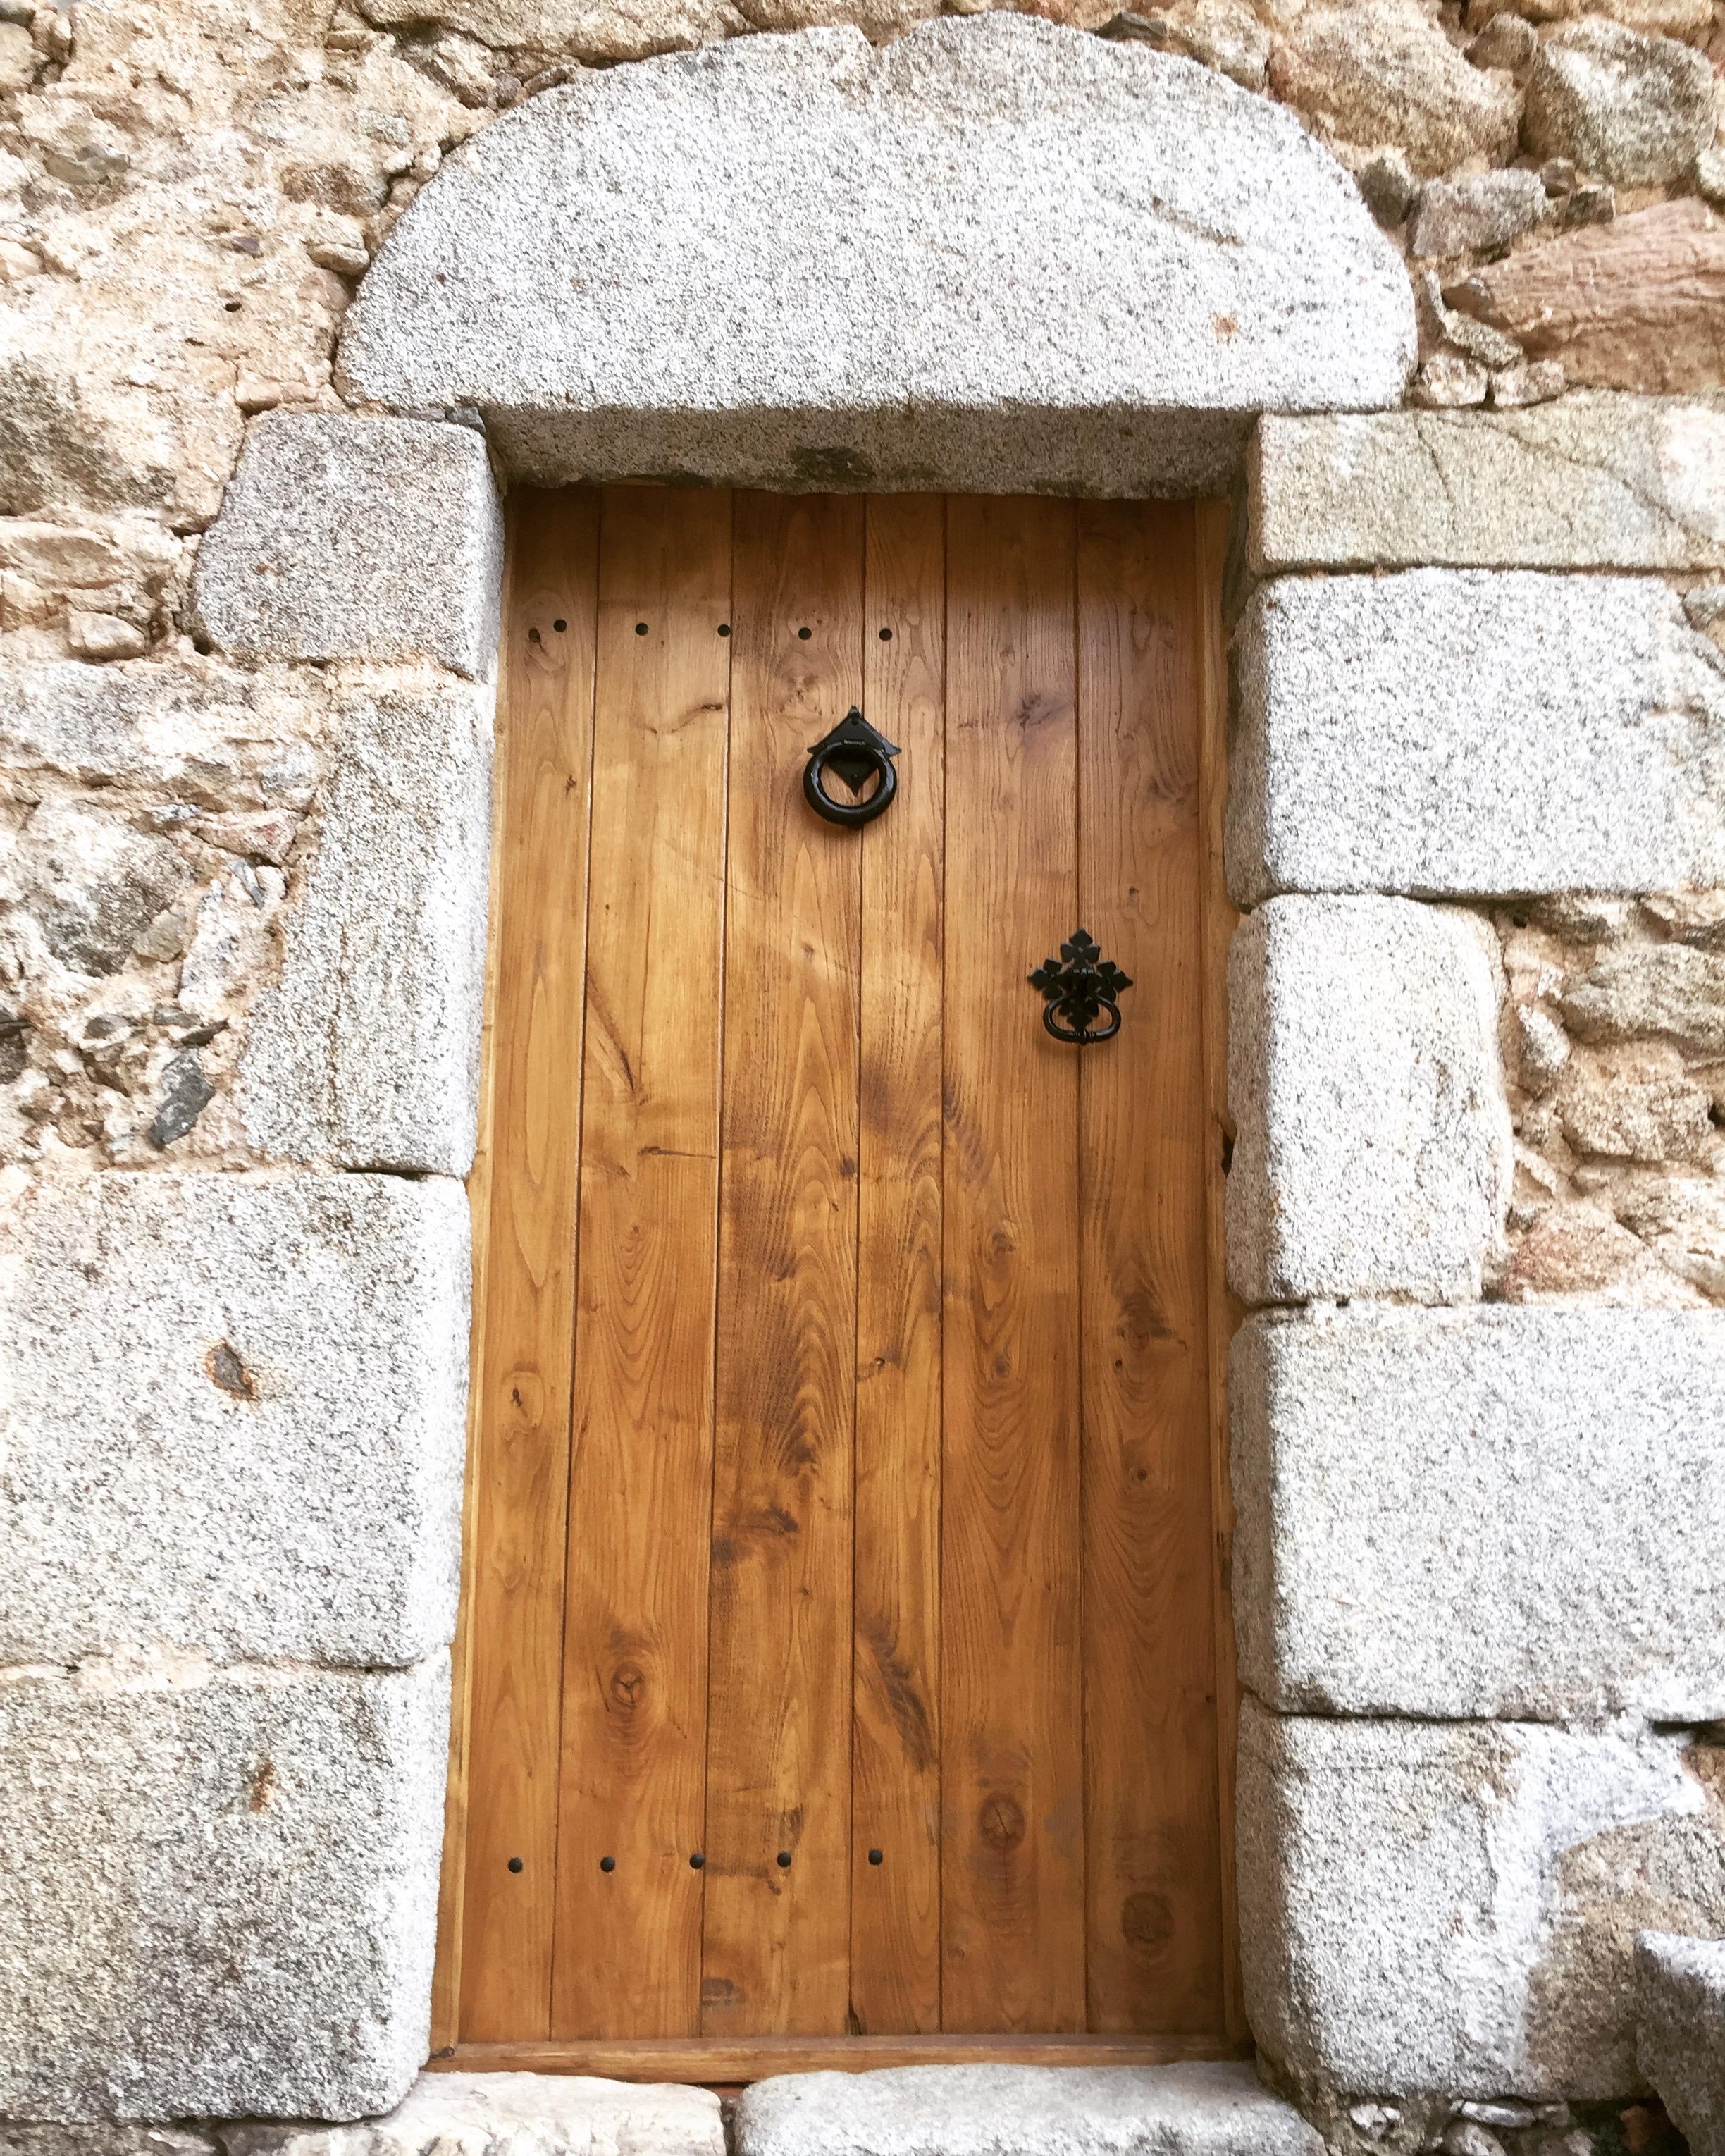 The front door at La Taillede